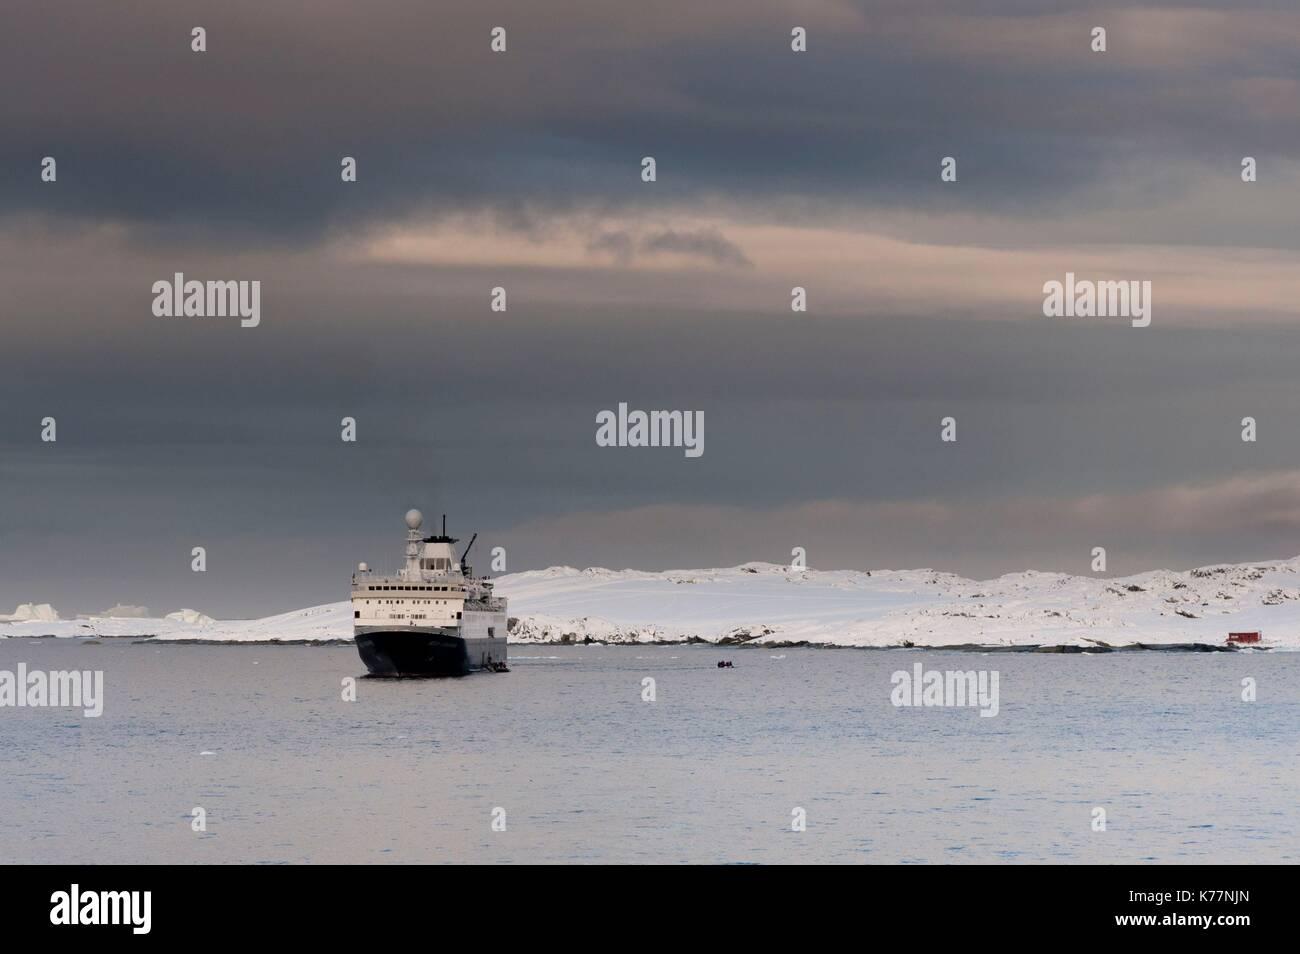 Ozean Endeavour Kreuzfahrtschiff der Lemaire Kanal, Antarktis Stockbild